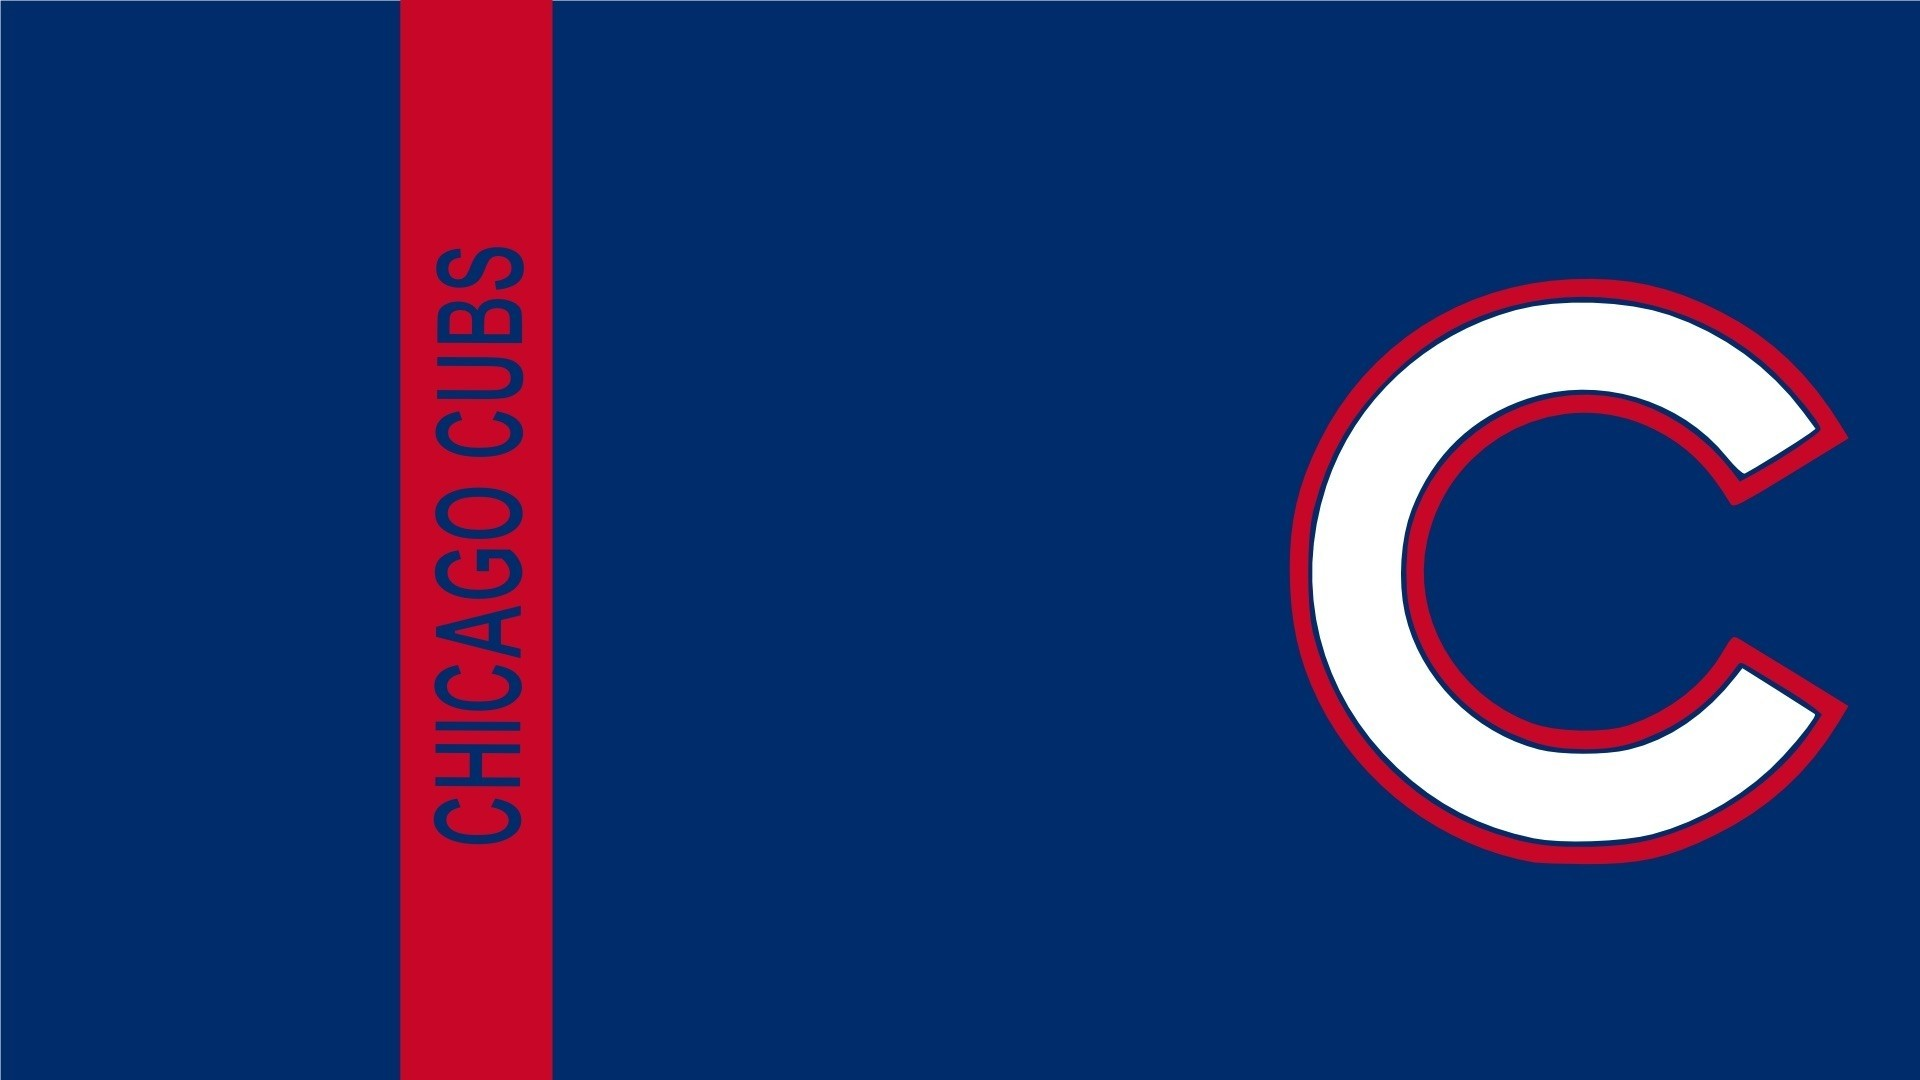 Cubs Background Wallpaper